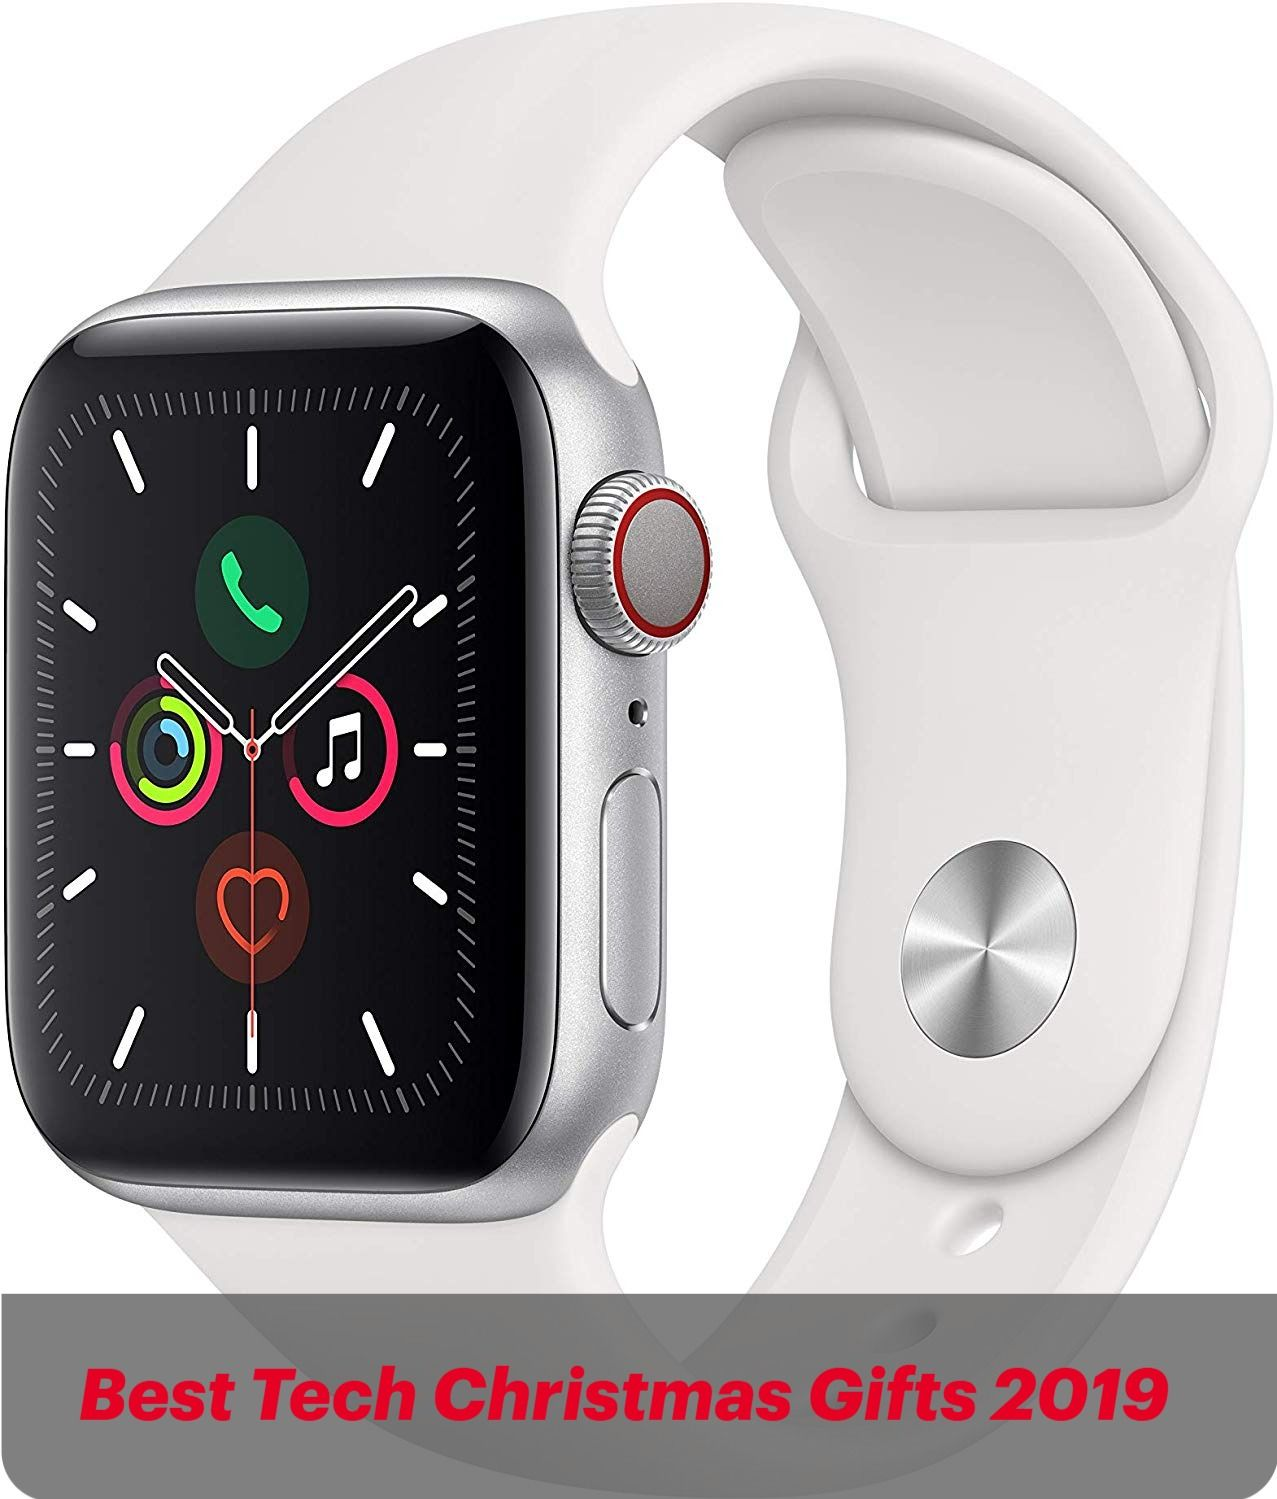 Apple Watch Christmas Sales 2020 Apple Watch Series 5 – Best Tech Christmas Gifts 2019 | Cool tech